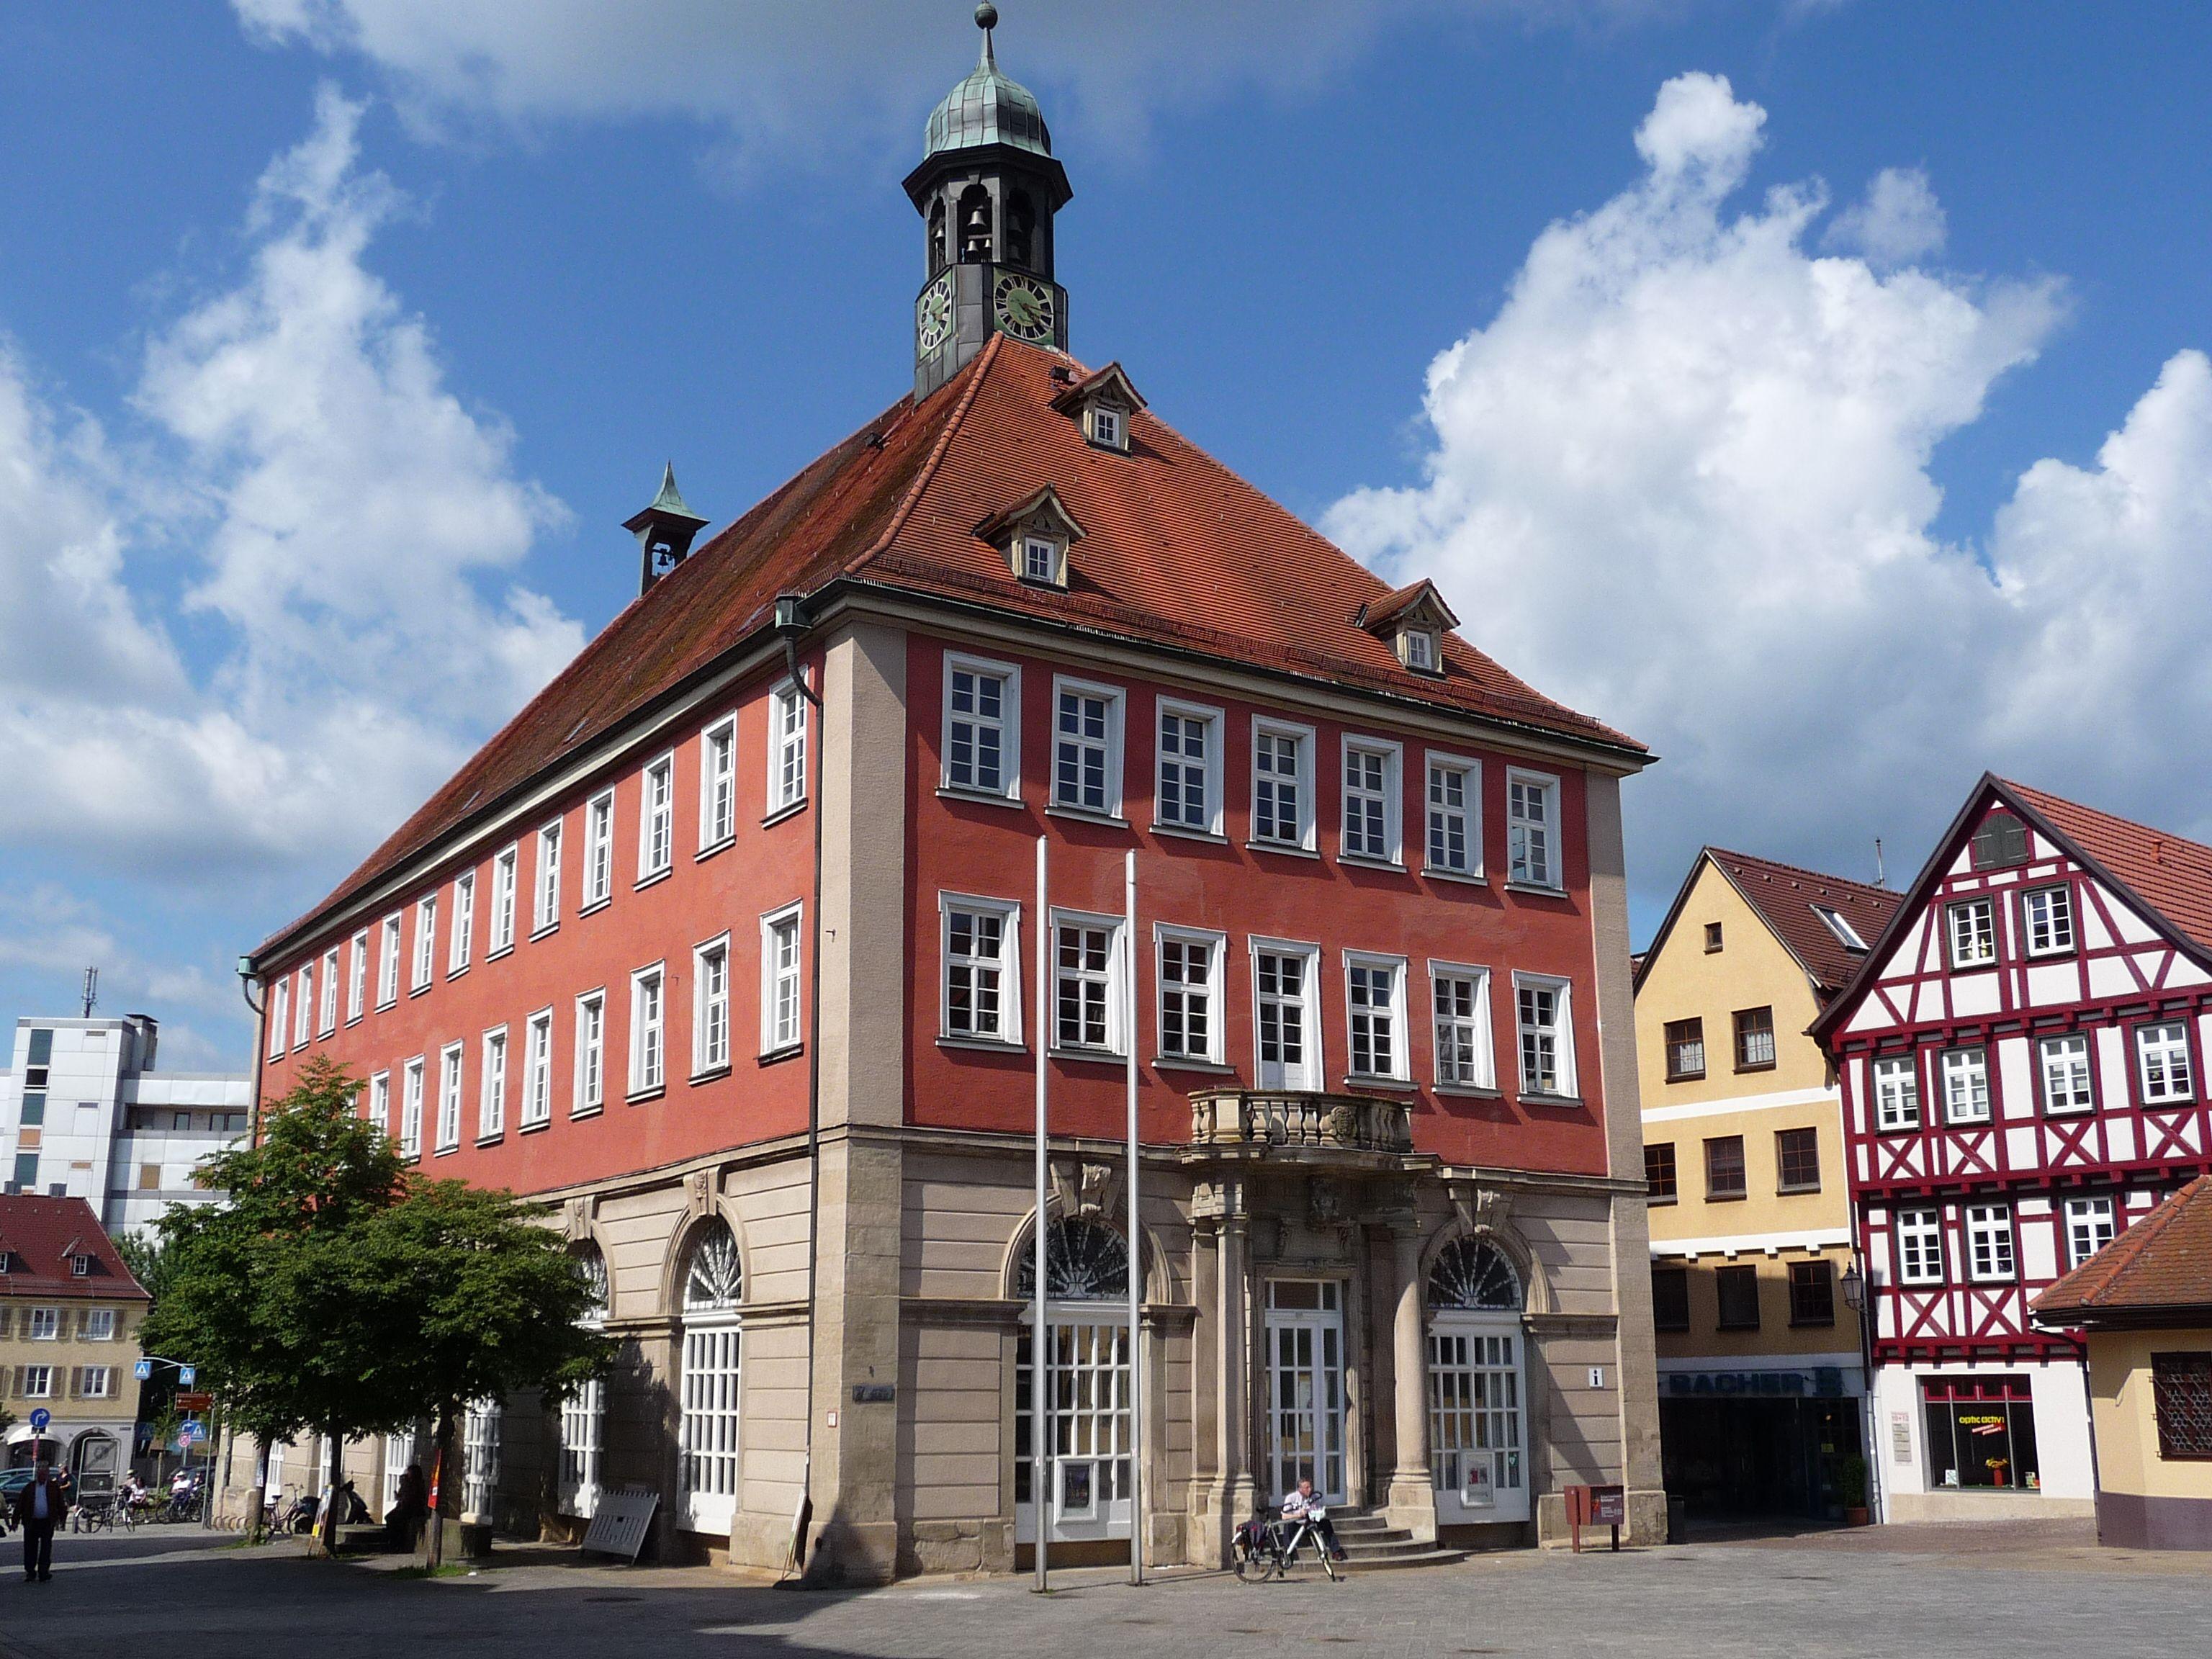 Rathaus Marktplatz 1